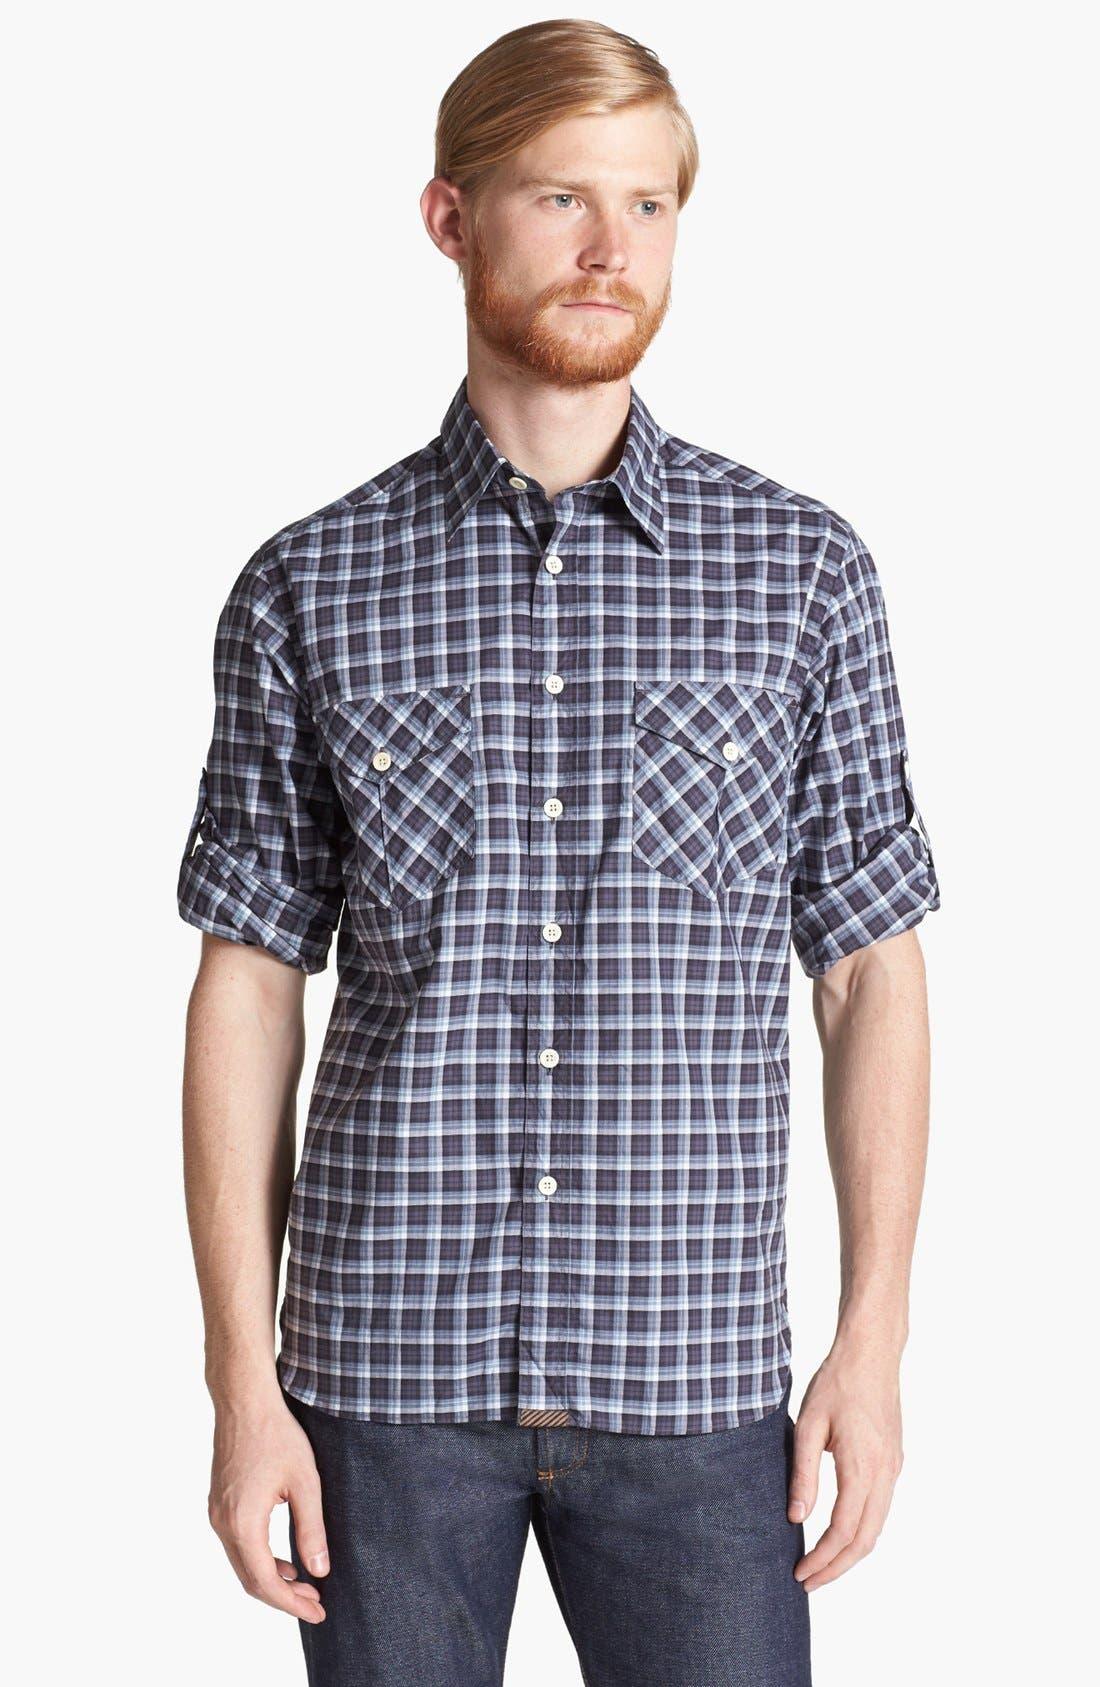 Alternate Image 1 Selected - Billy Reid 'Helton' Plaid Shirt